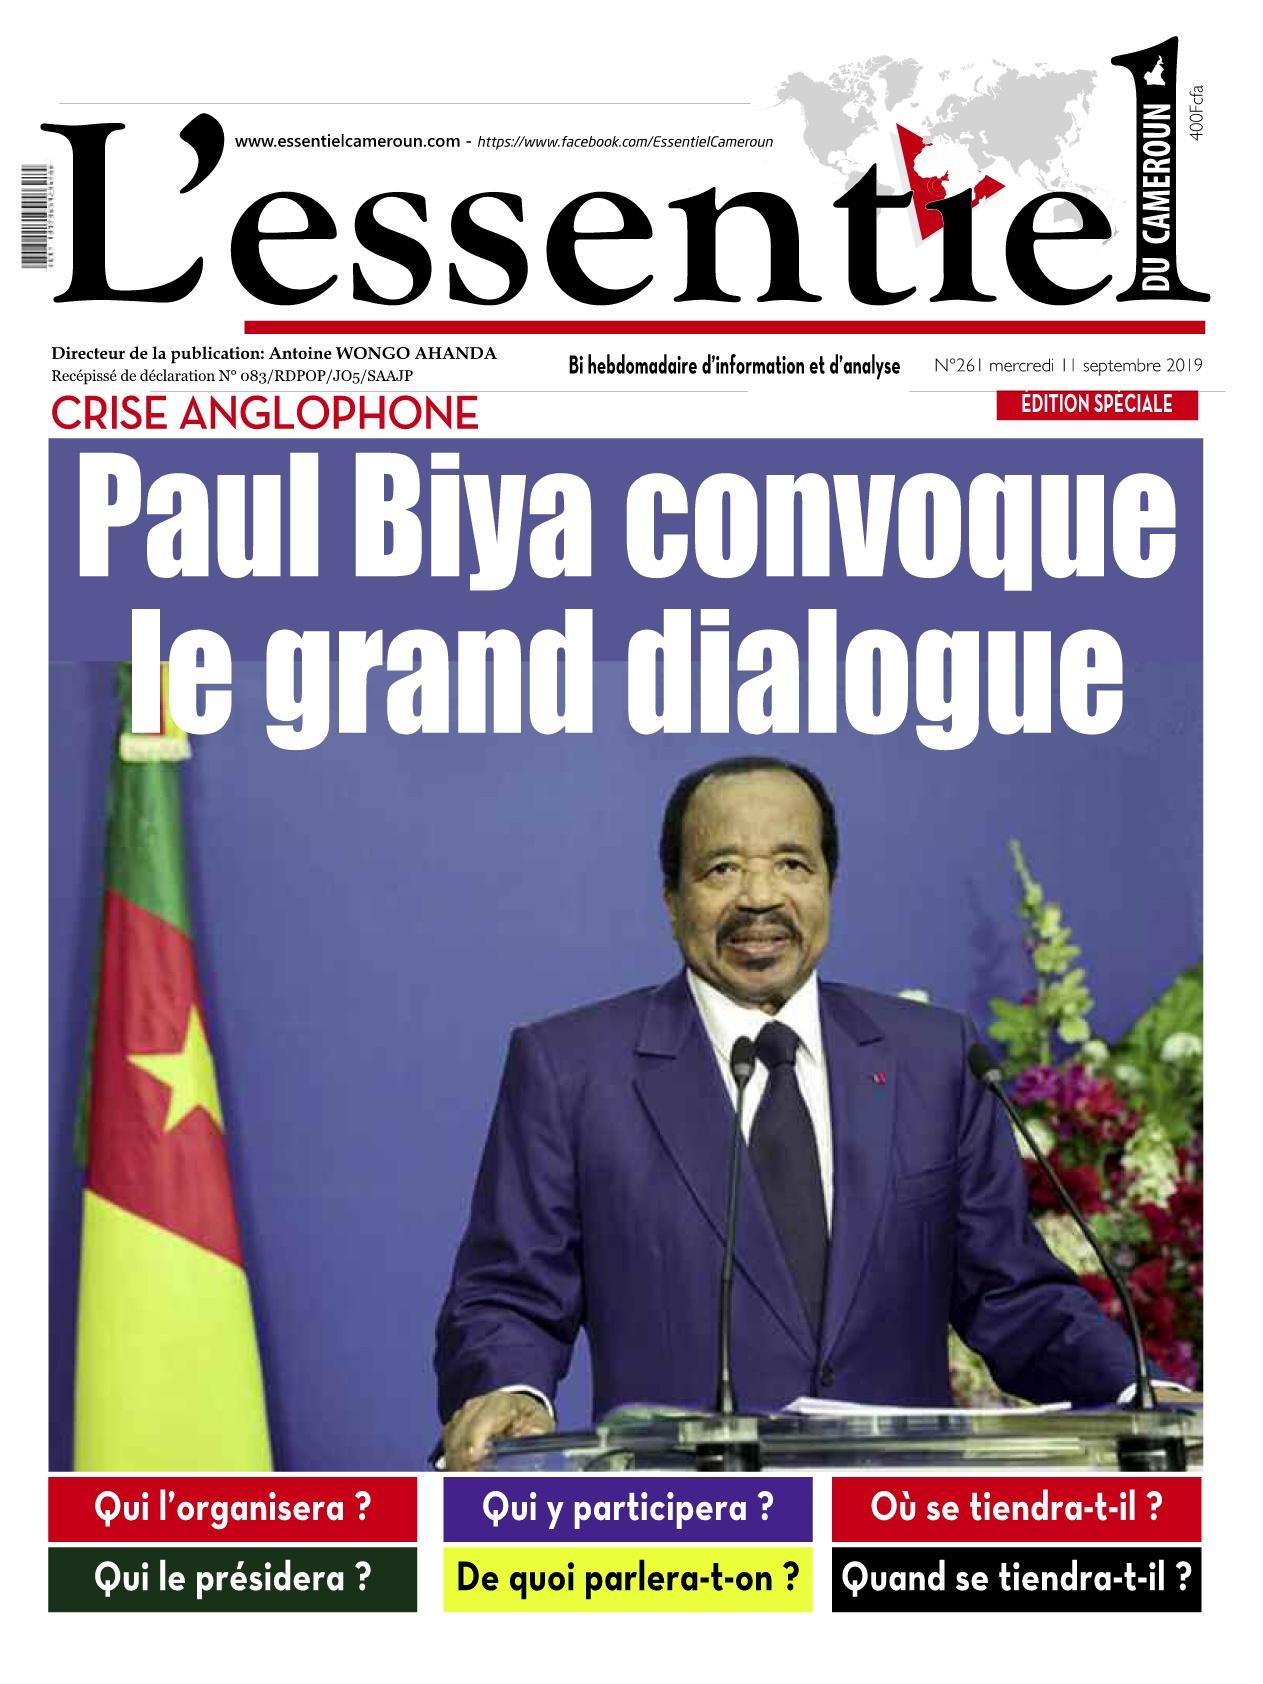 L'essentiel du Cameroun - 11/09/2019